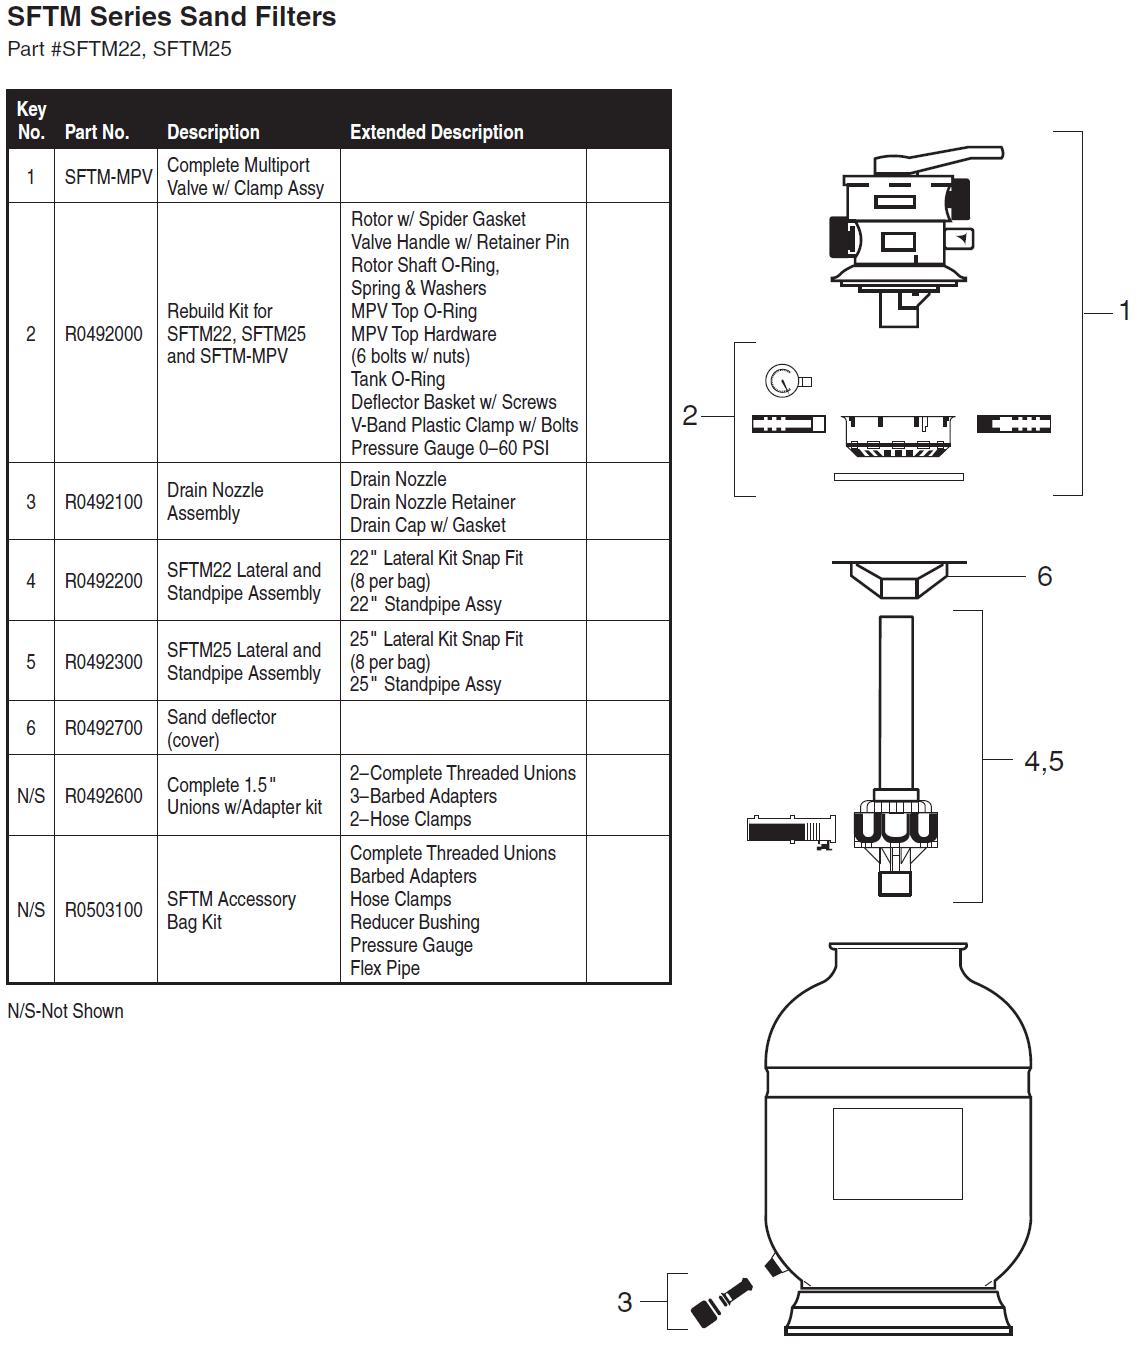 Jandy Sftm Series Sand Filter Parts